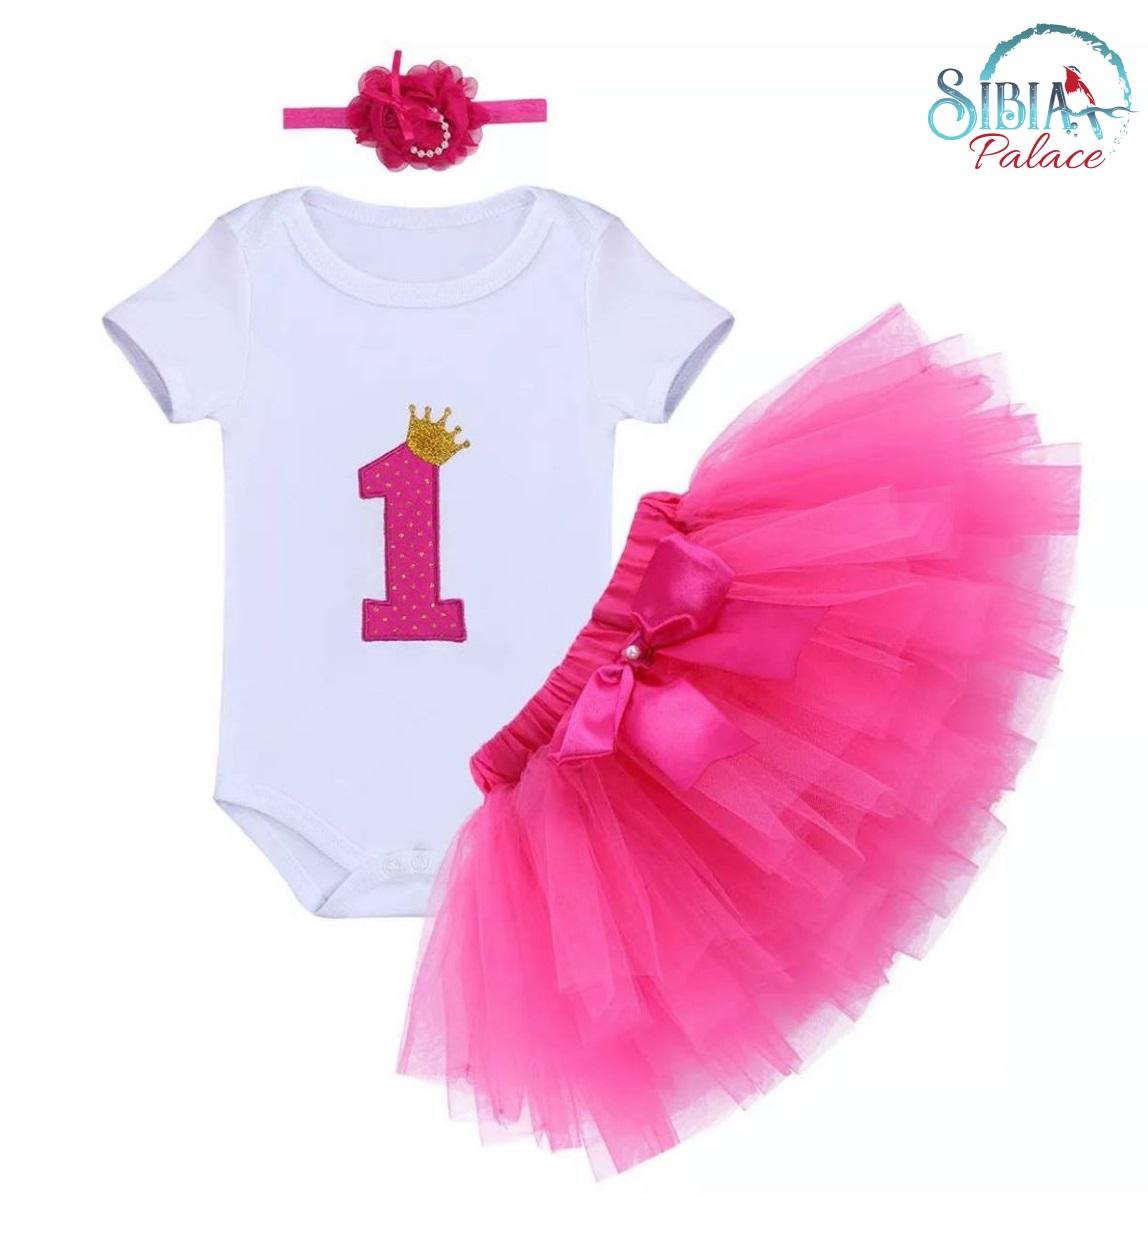 1st Birthday Princess Dress.Sibia Palace Baby Girl 1st Birthday Princess Rose Pink Glitter Outfit Dress